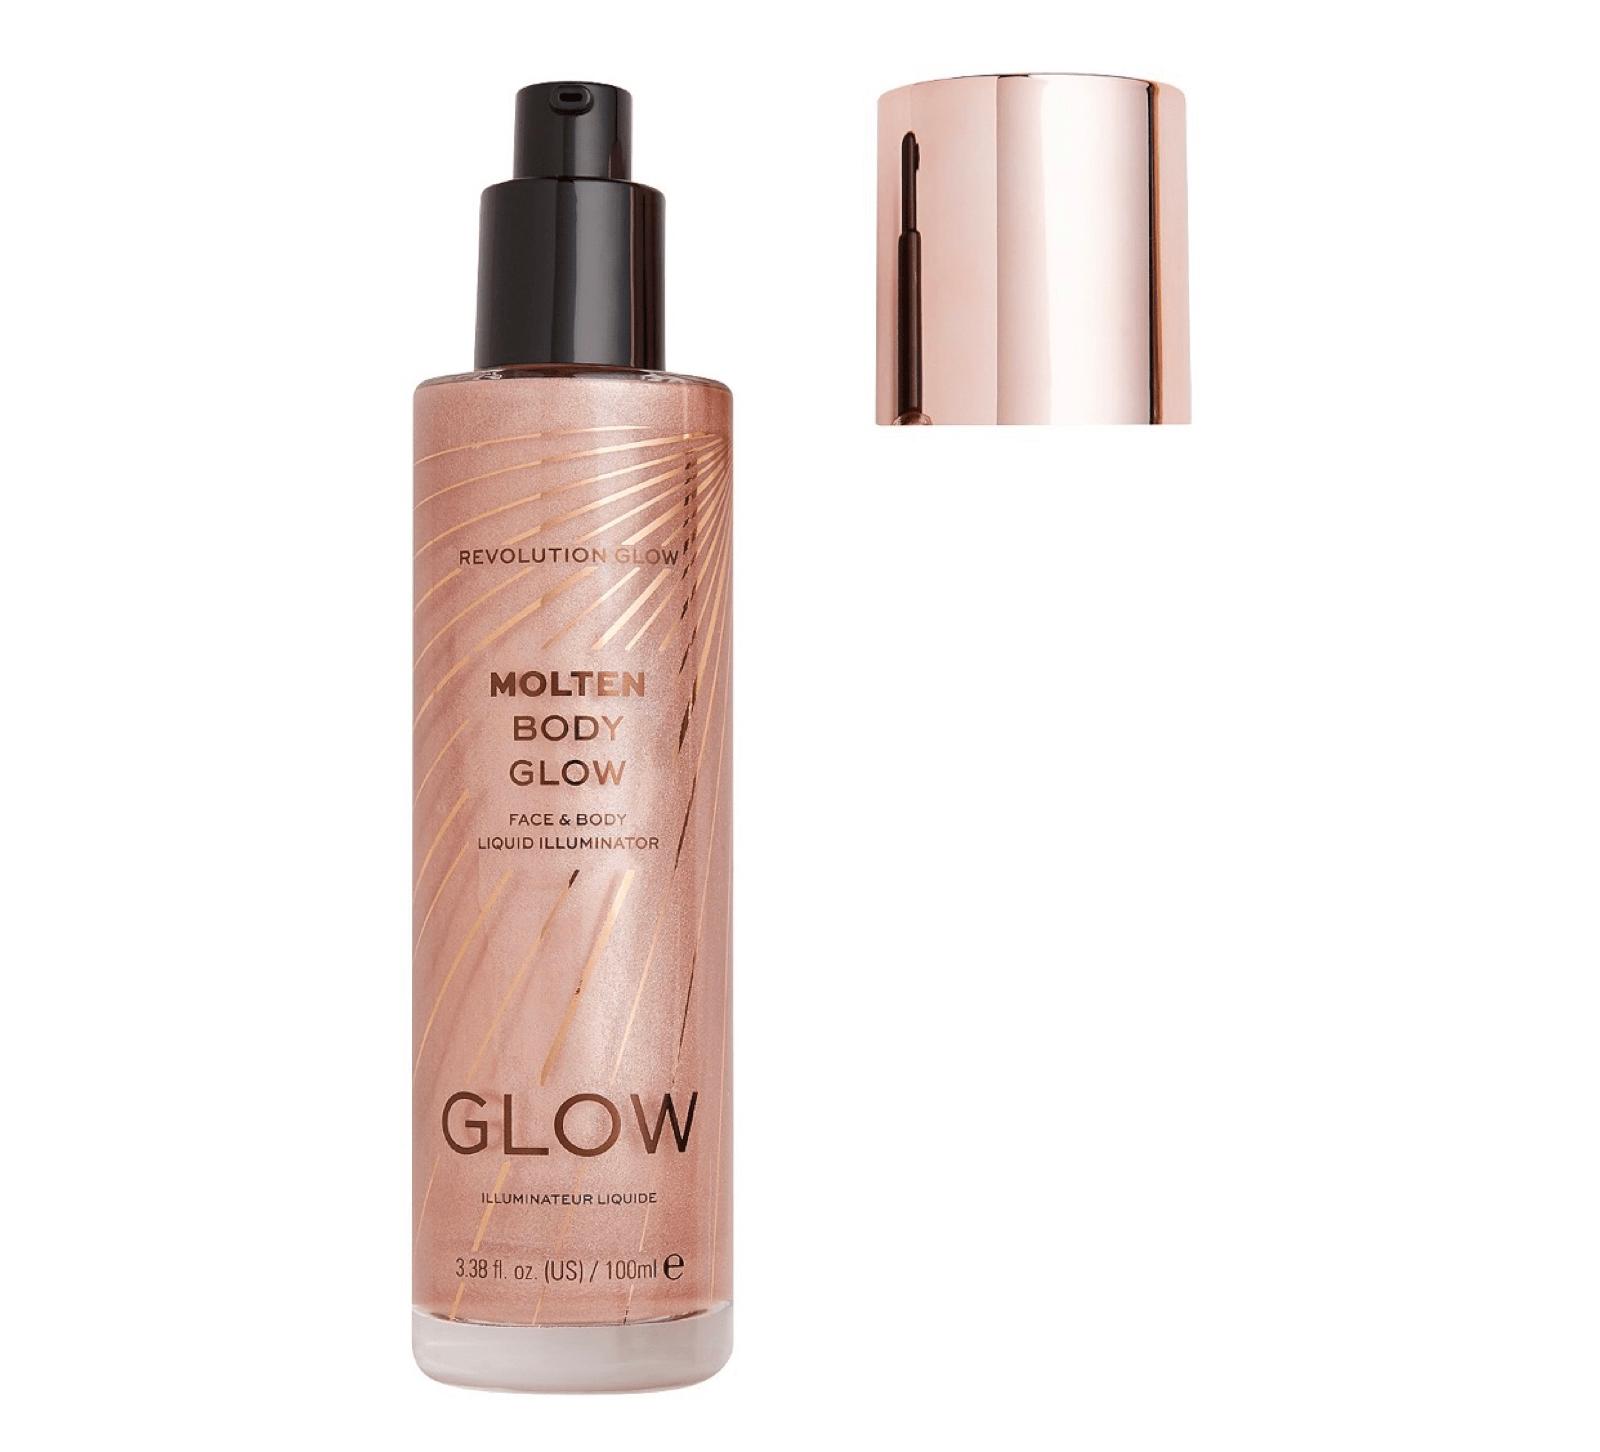 Revolution Molten Body Glow Face and Body Liquid Illuminator